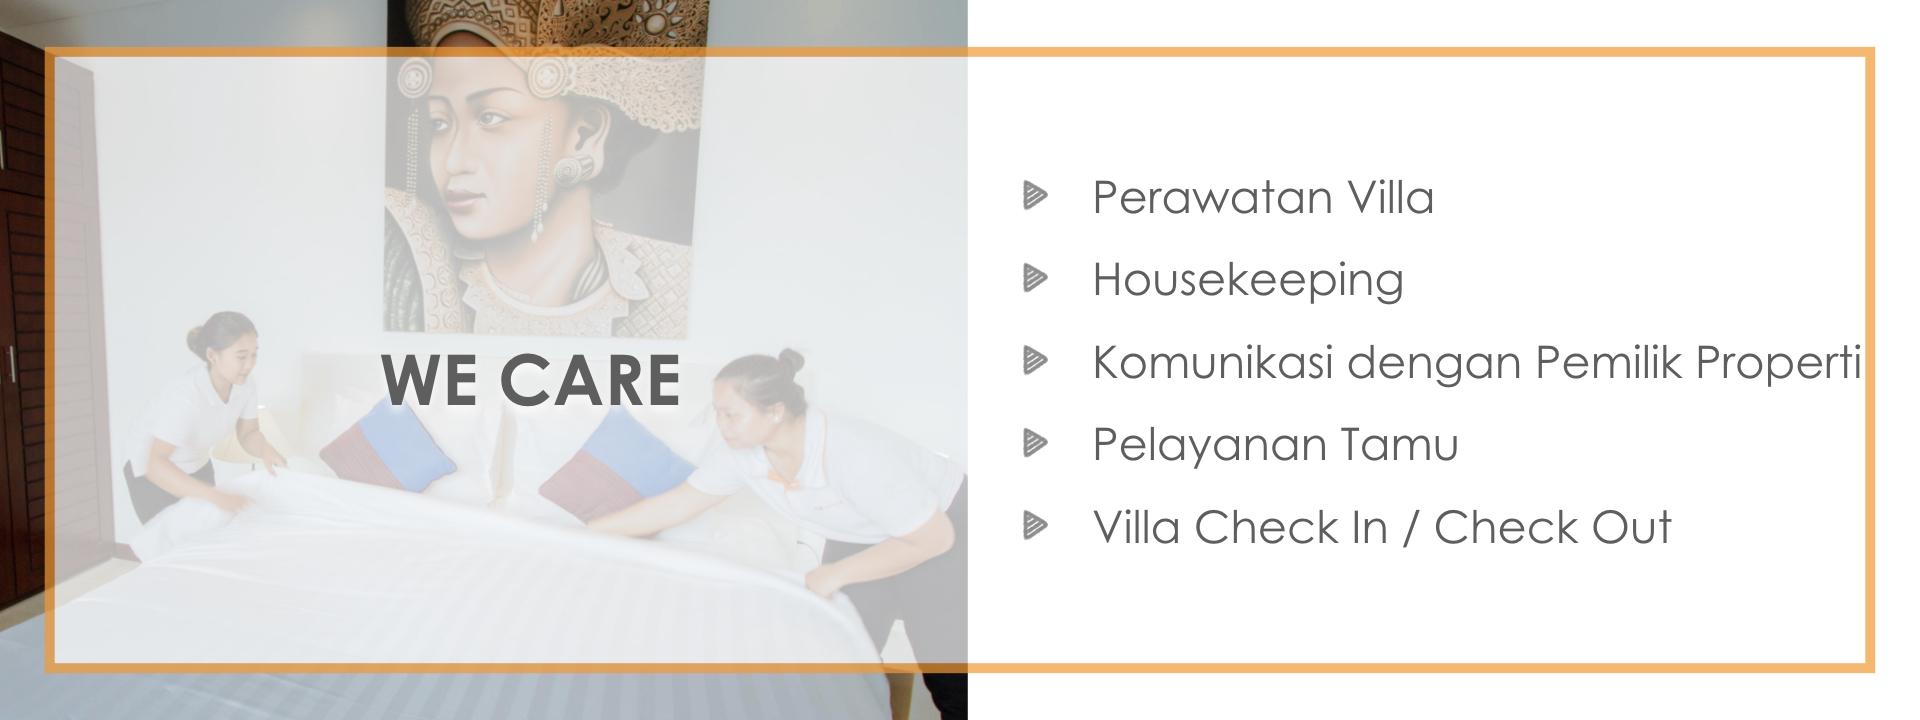 Bali Management Villa and Property Pemeliharaan Villa.jpg